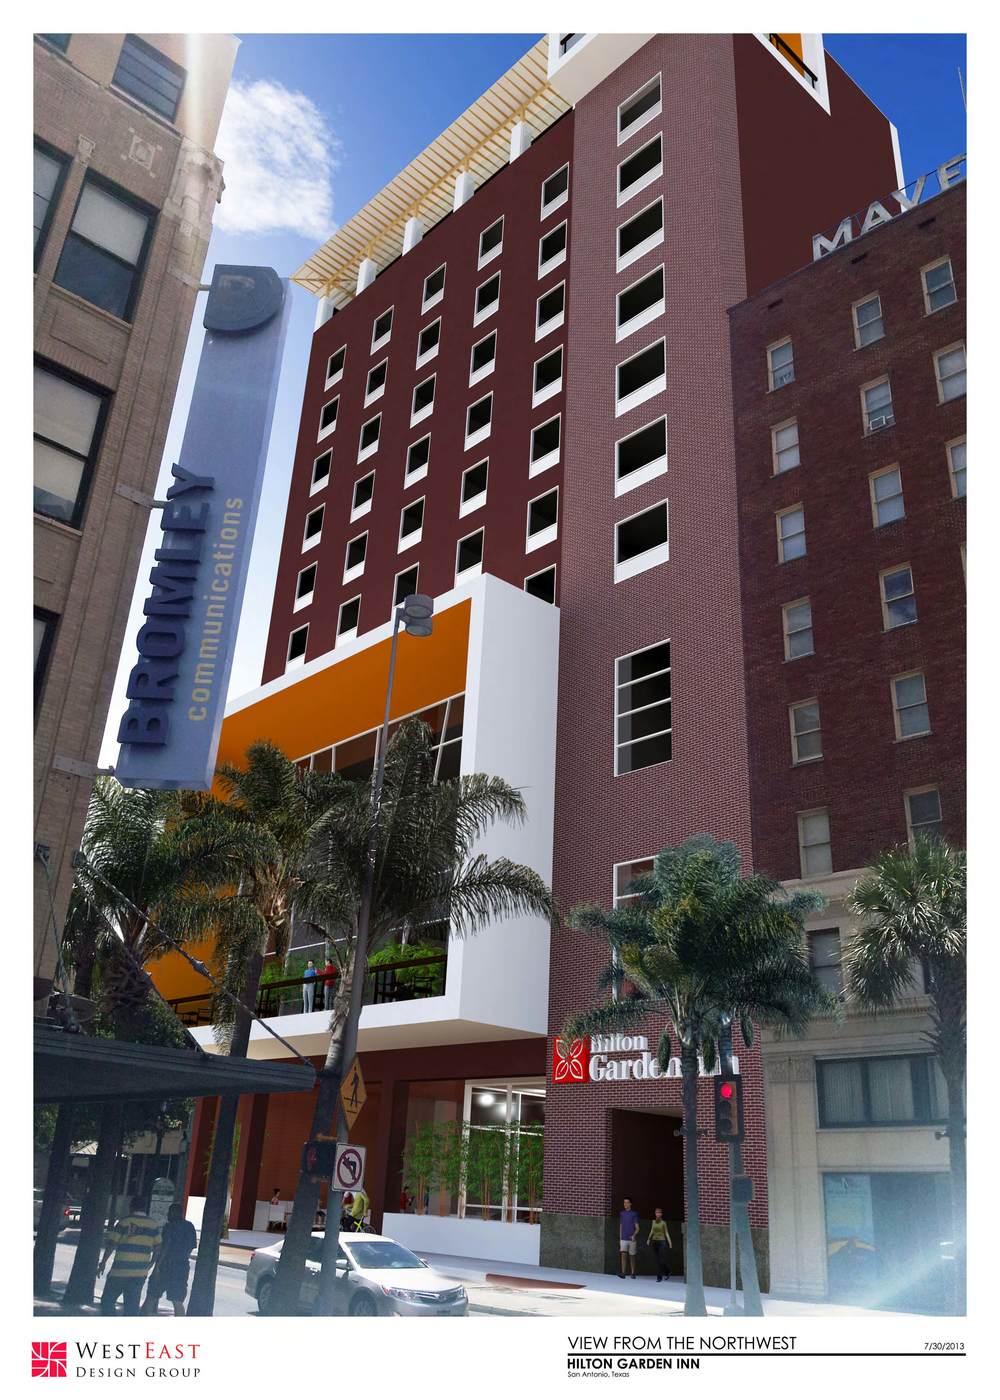 Hilton Garden Inn - Color Imagery - 2013-07-31_Page_04.jpg